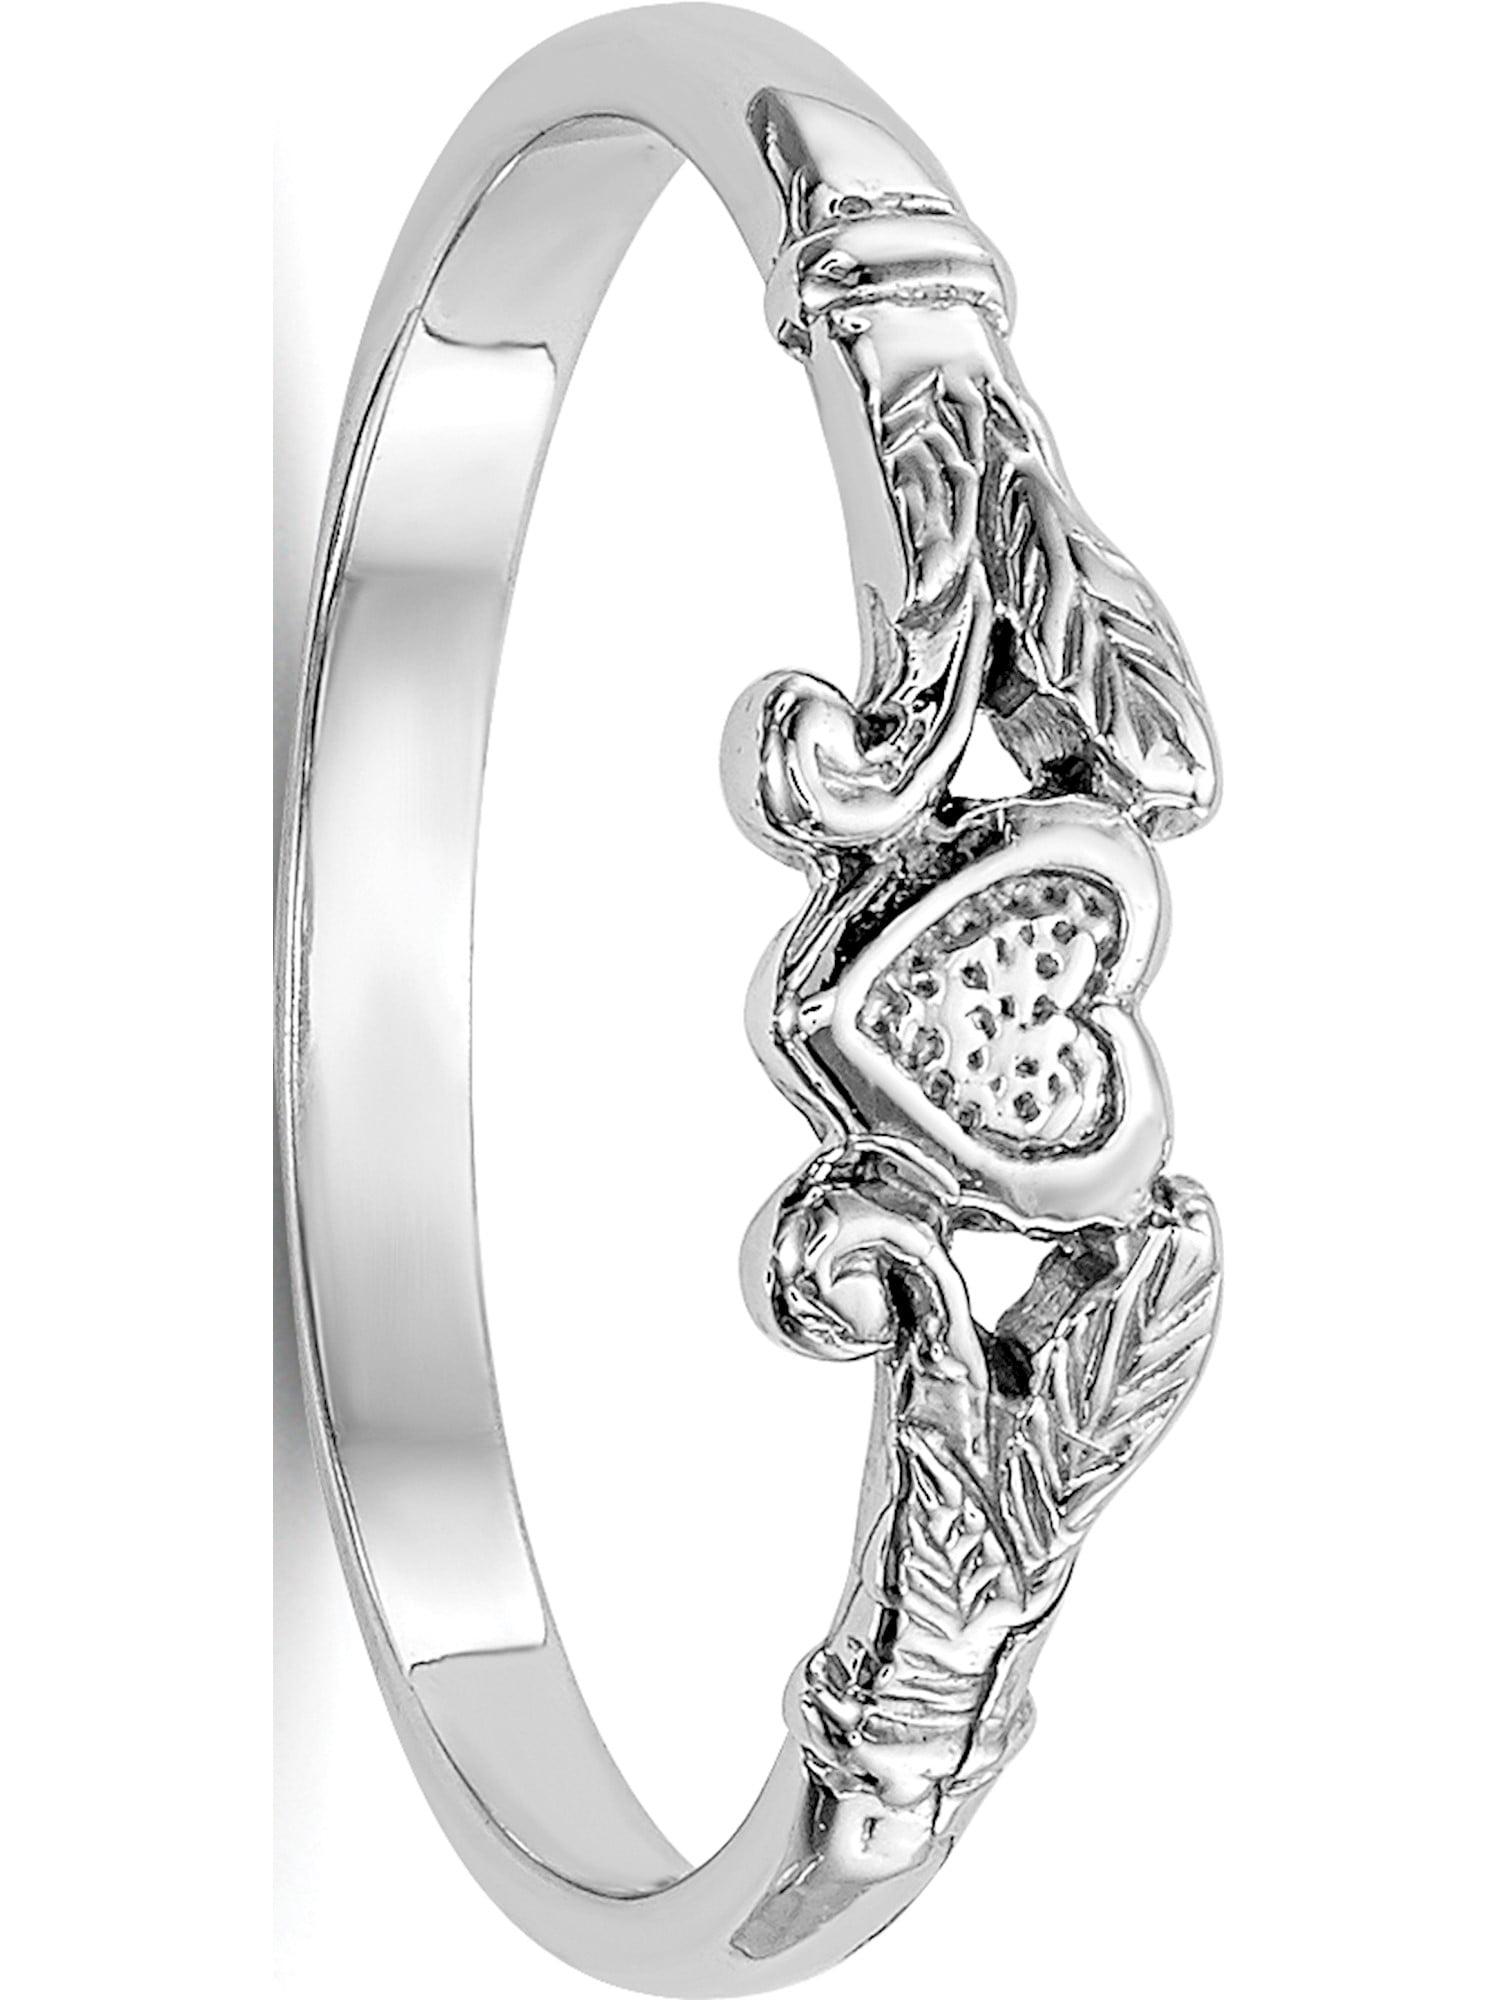 14k White Gold White Textured Mini Heart Baby Ring